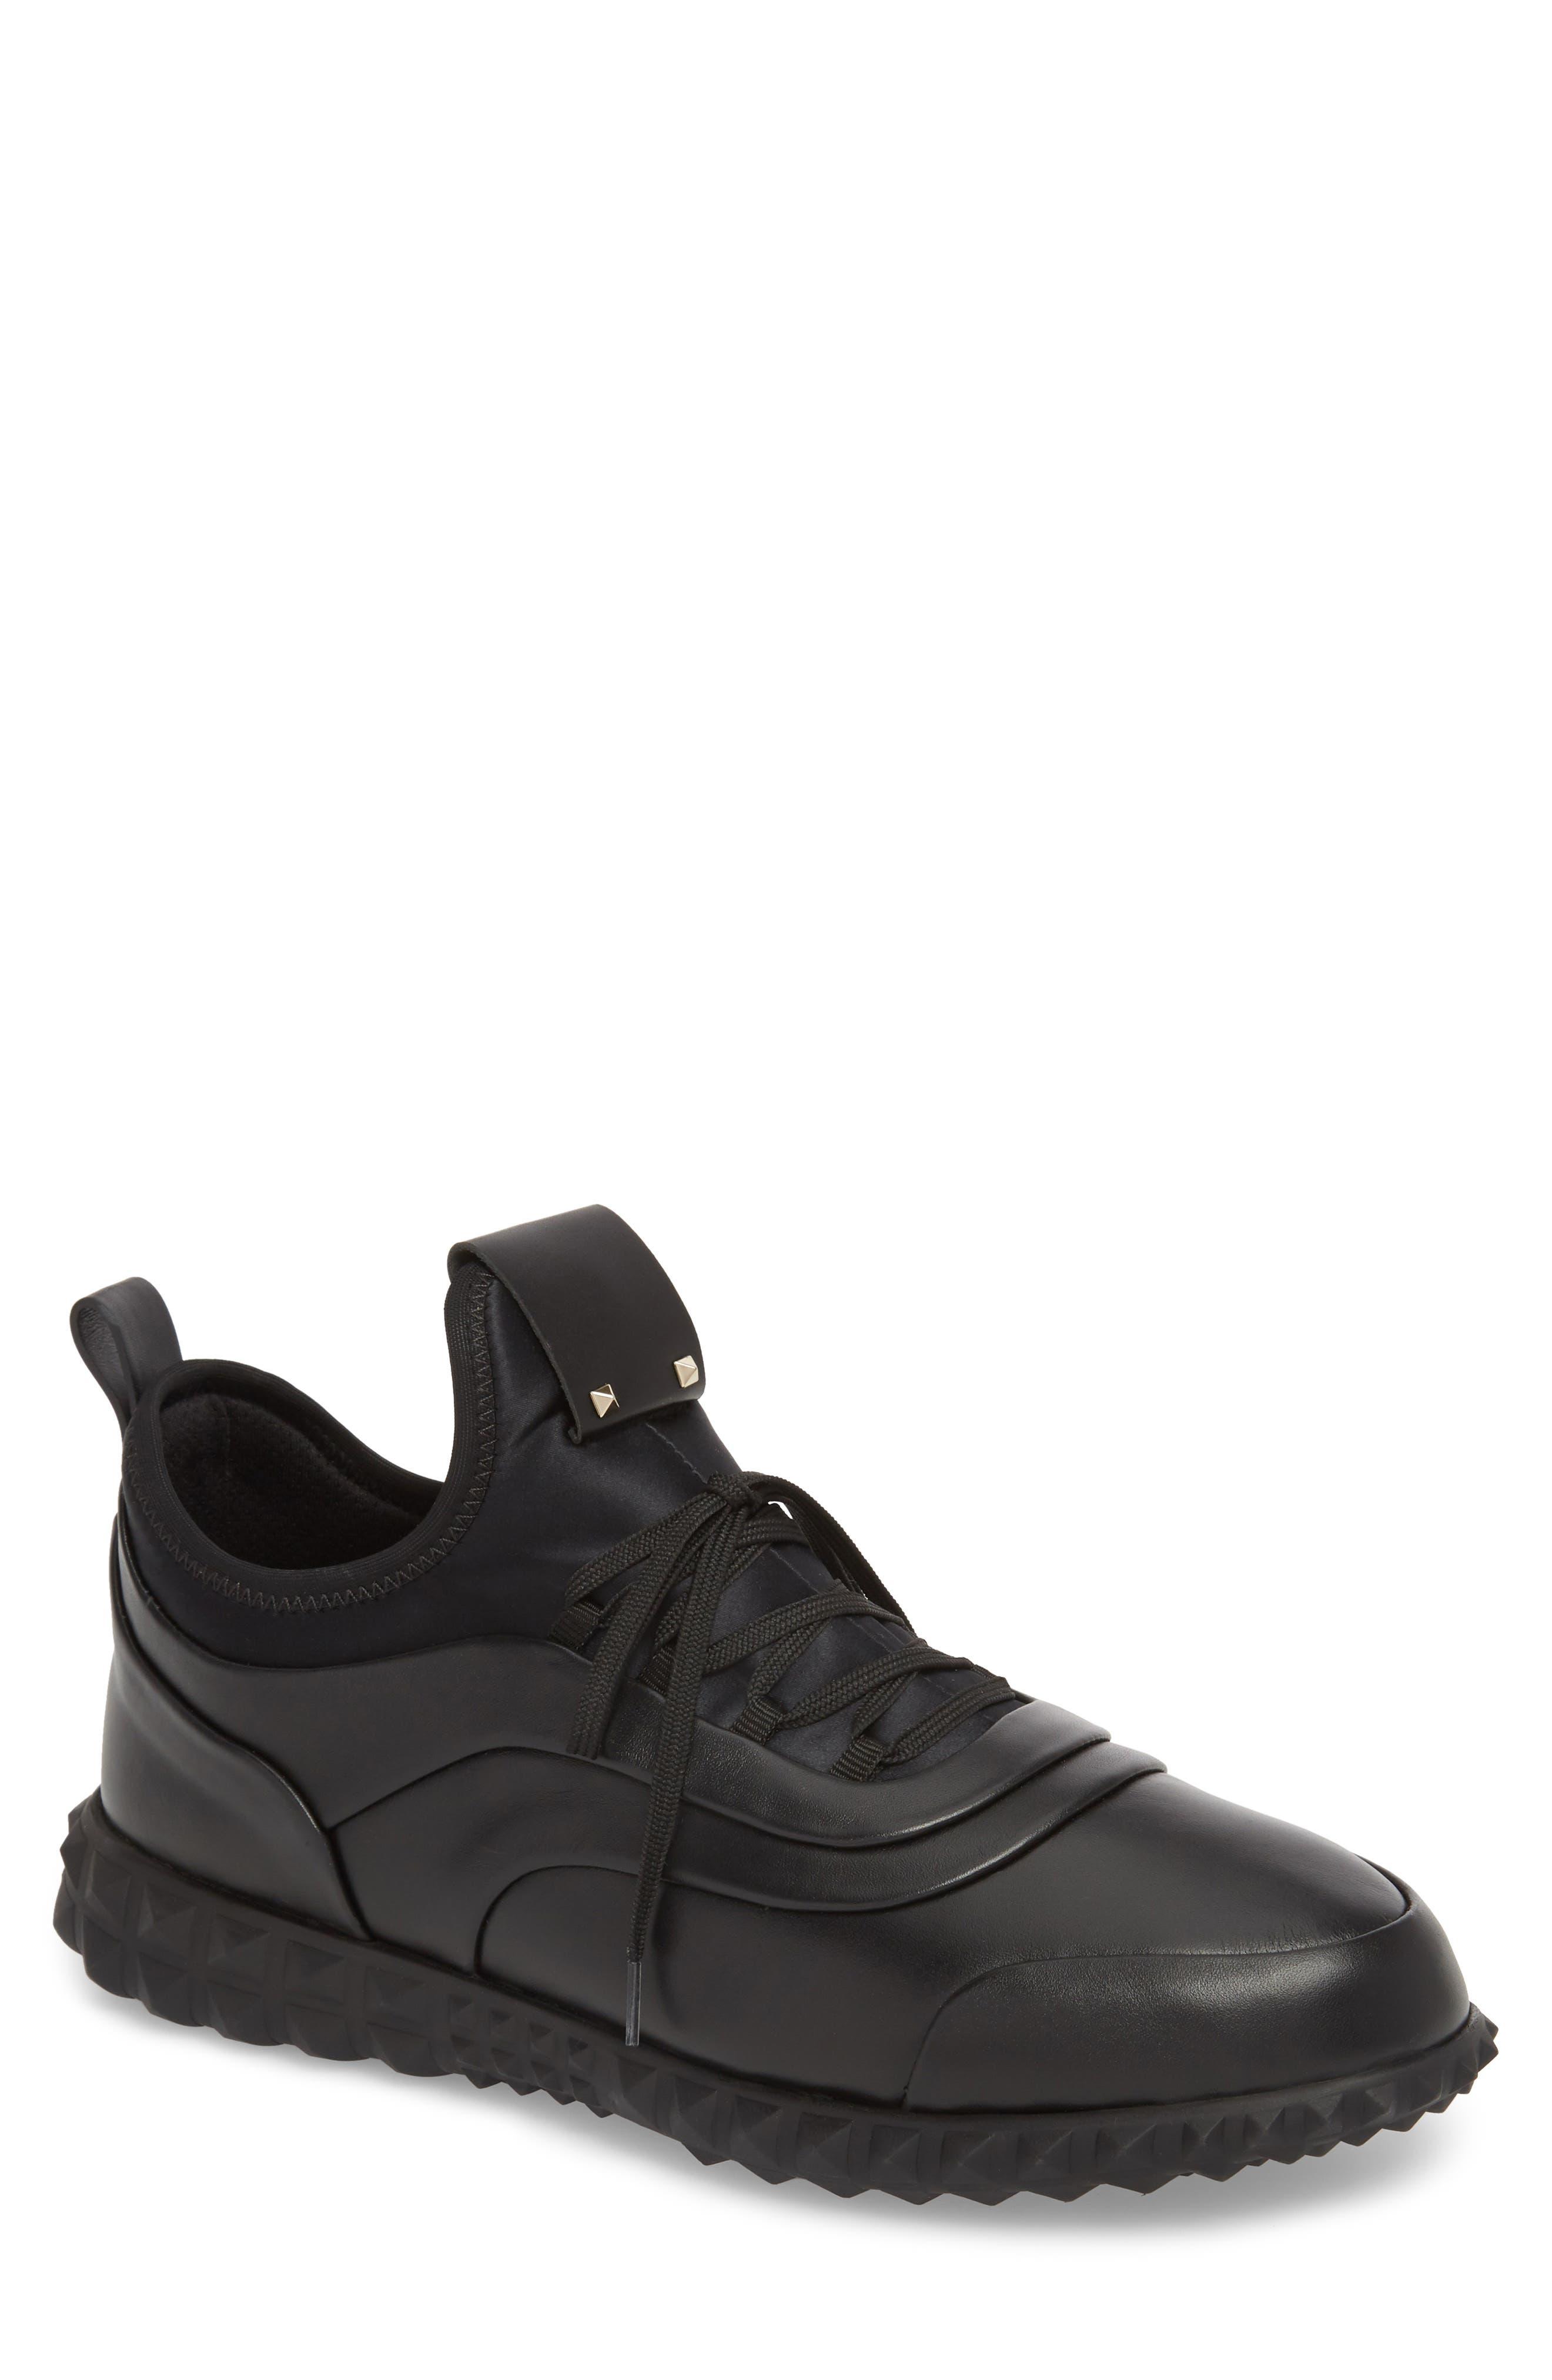 Bodytech Sneaker,                             Main thumbnail 1, color,                             BLACK/ BLACK